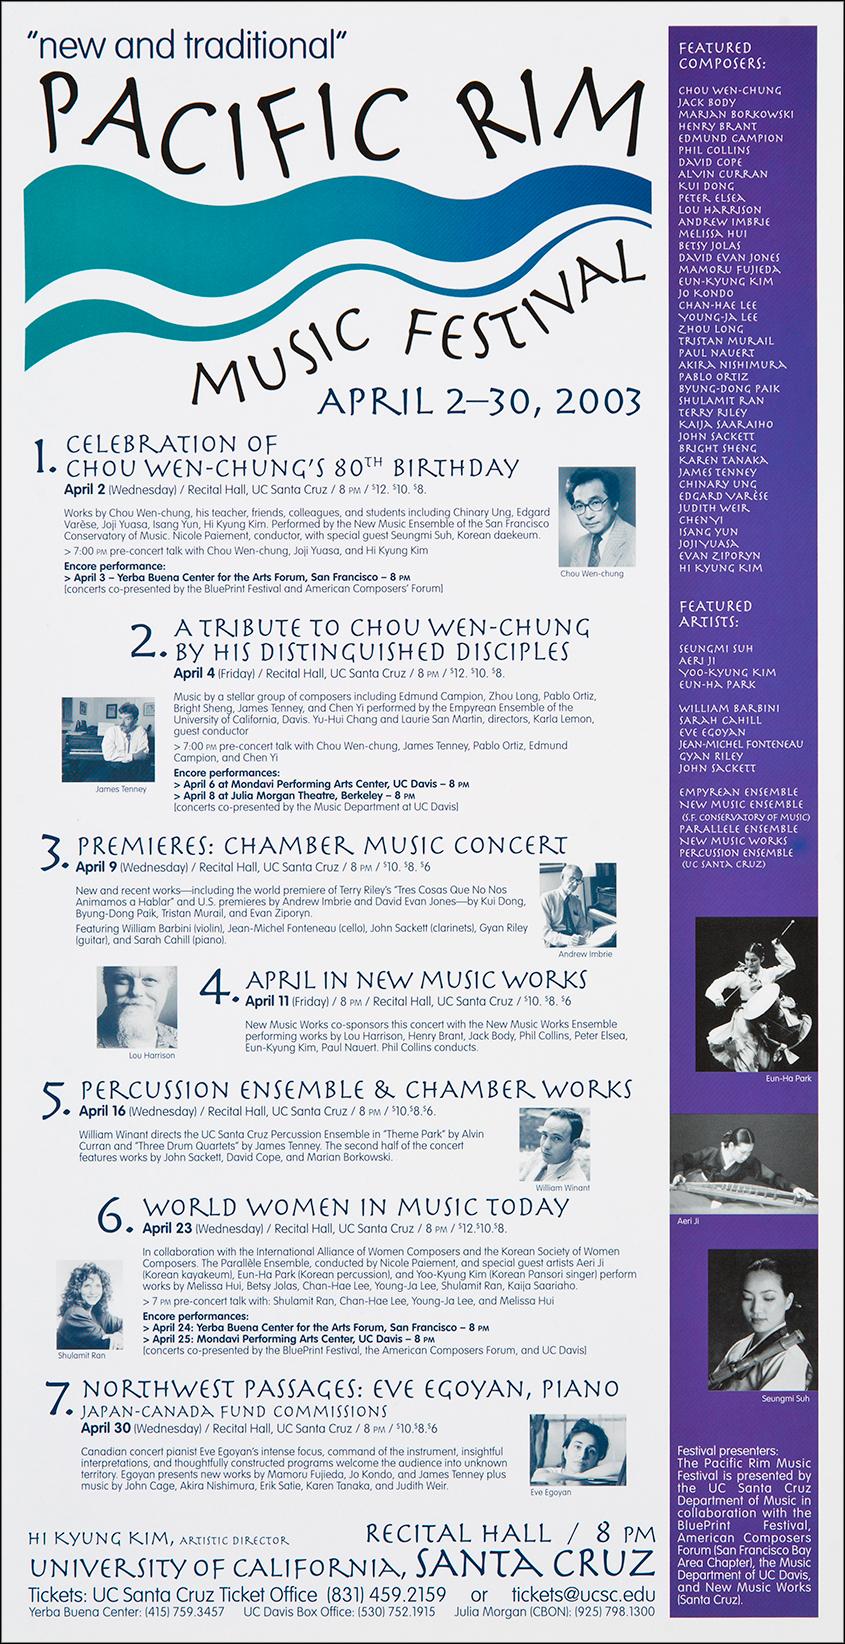 Pacific Rim Music Festival 2003 Poster